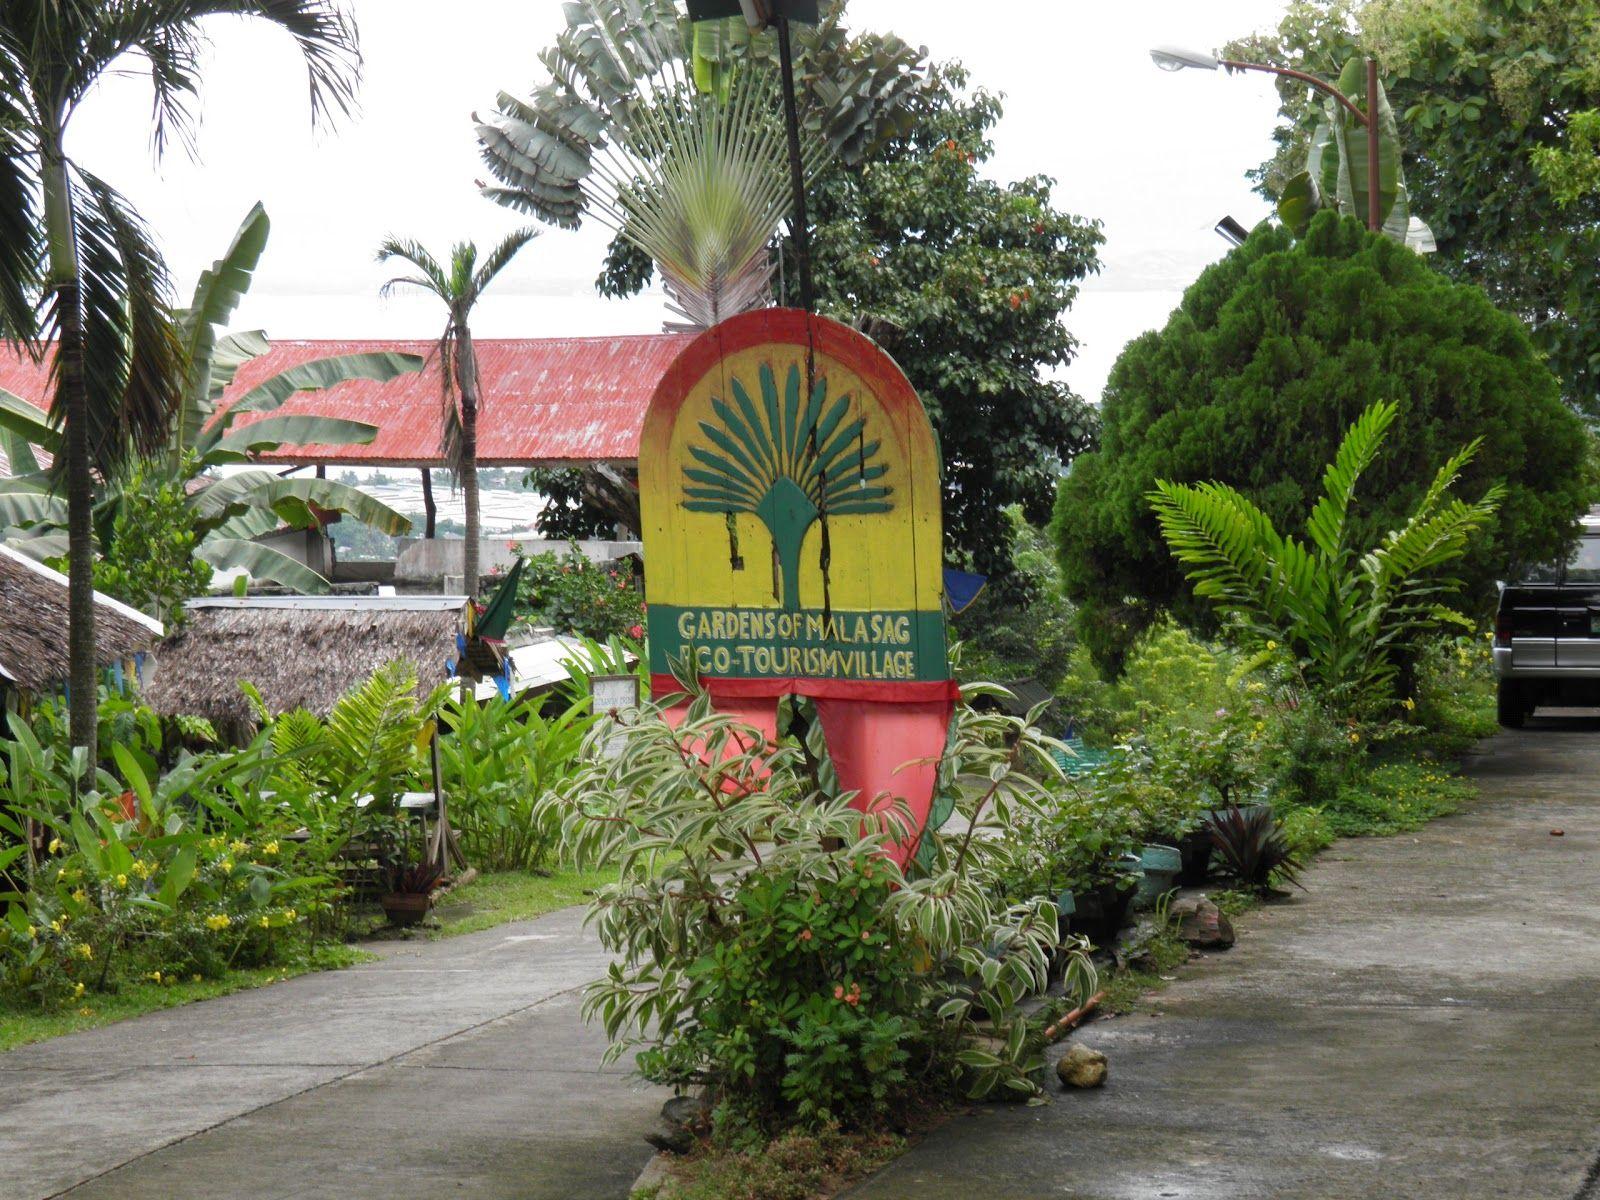 Cagayan De Oro Hotels Resort - Garden of Malasag Eco-Tourism ...